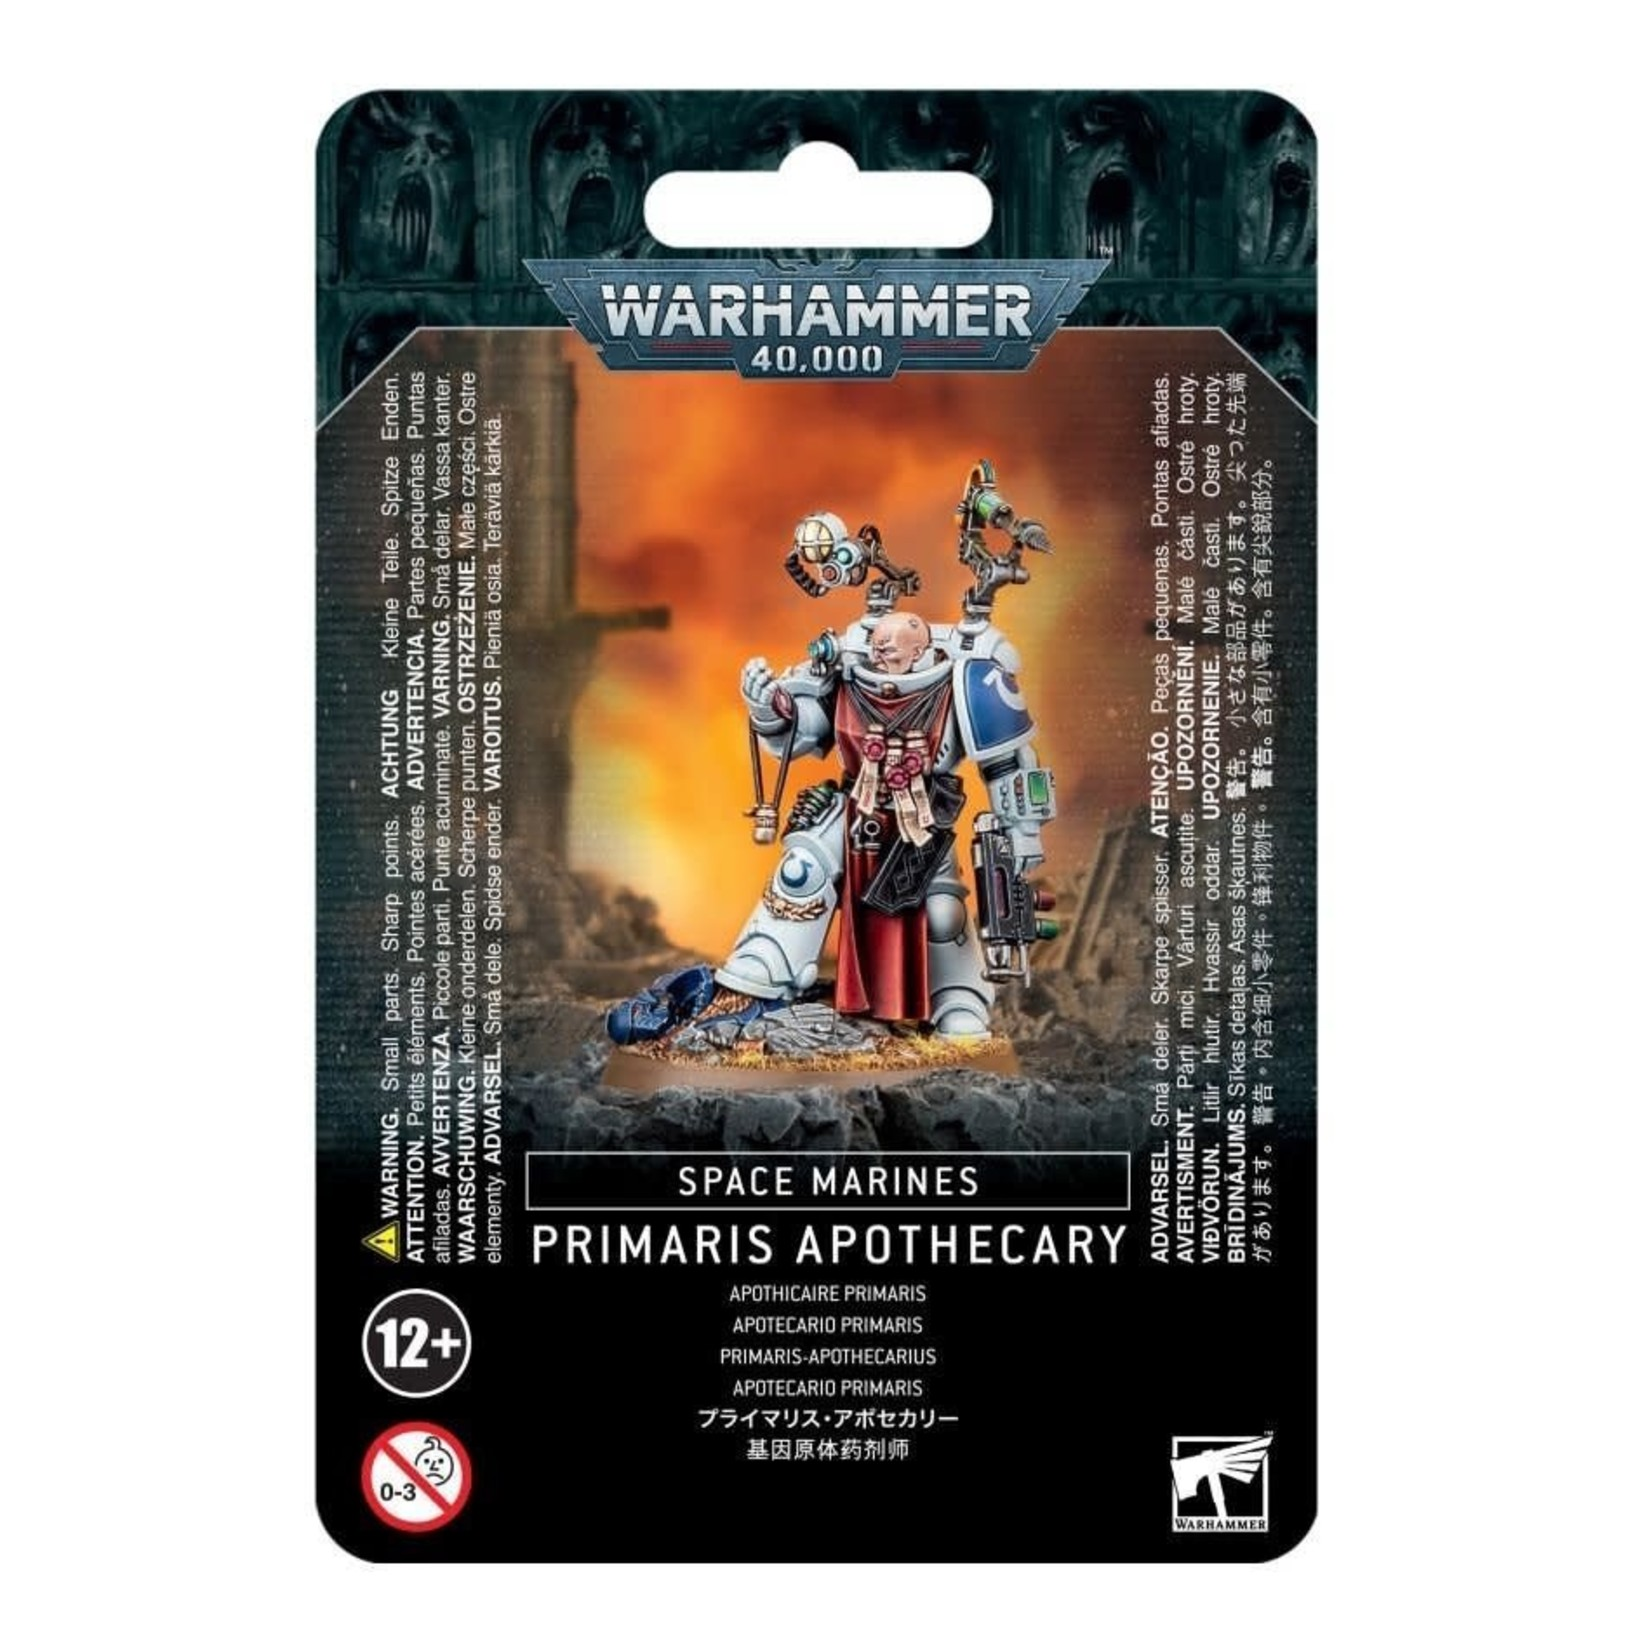 Games Workshop Warhammer 40k: Space Marine - Primaris Apothecary